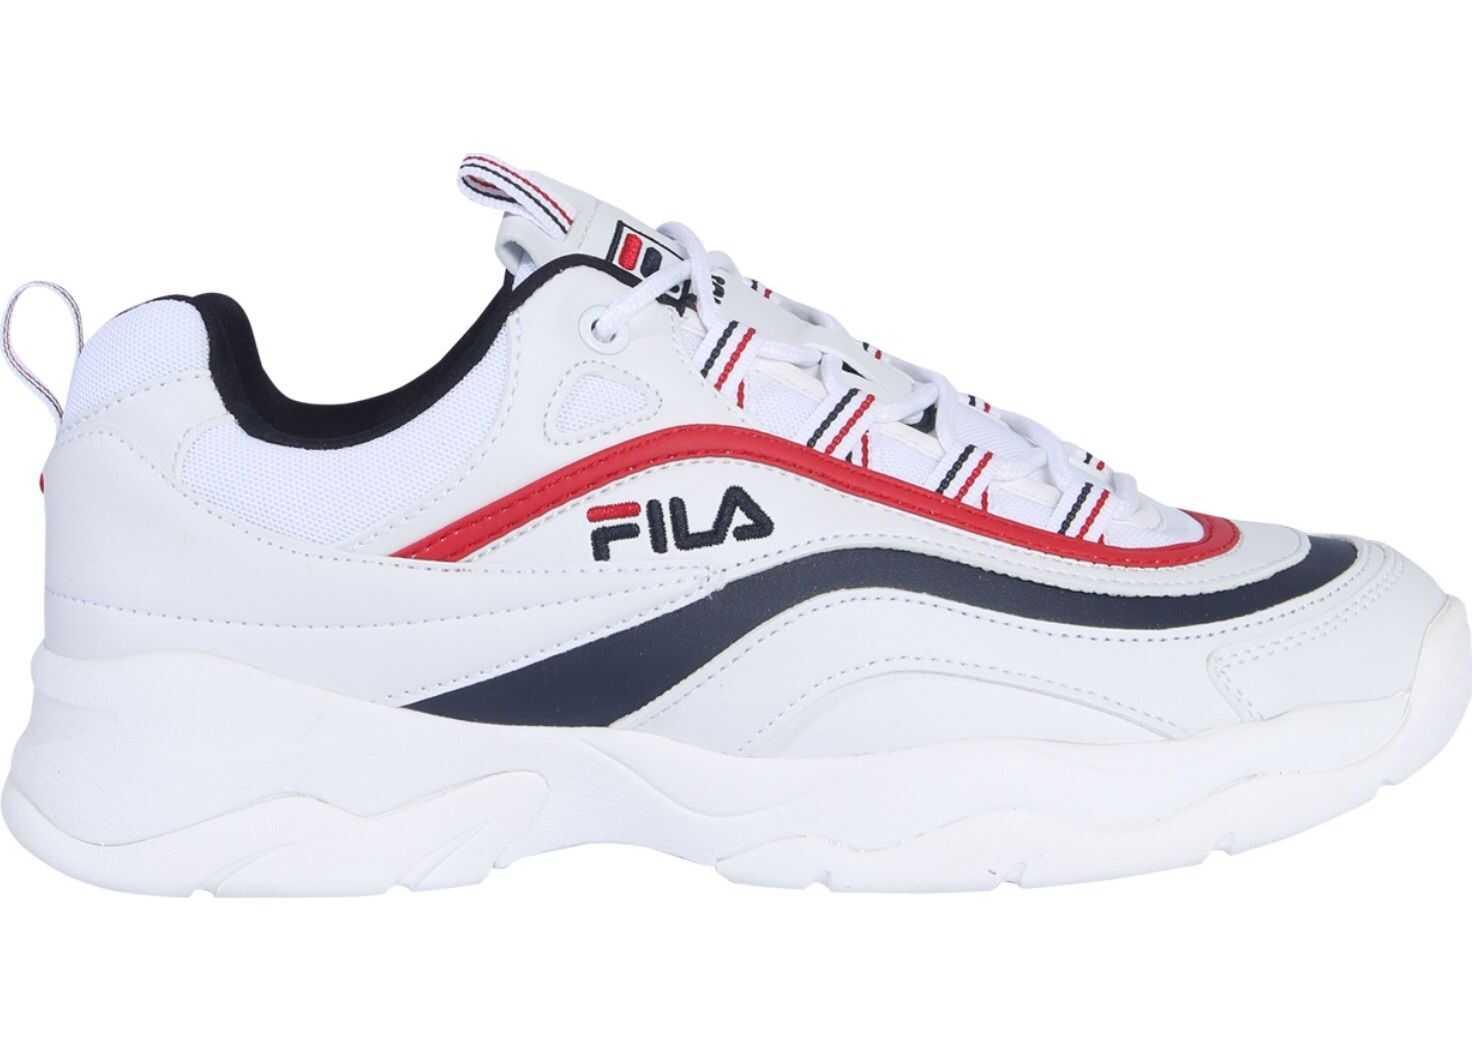 Fila Ray Low Sneakers WHITE